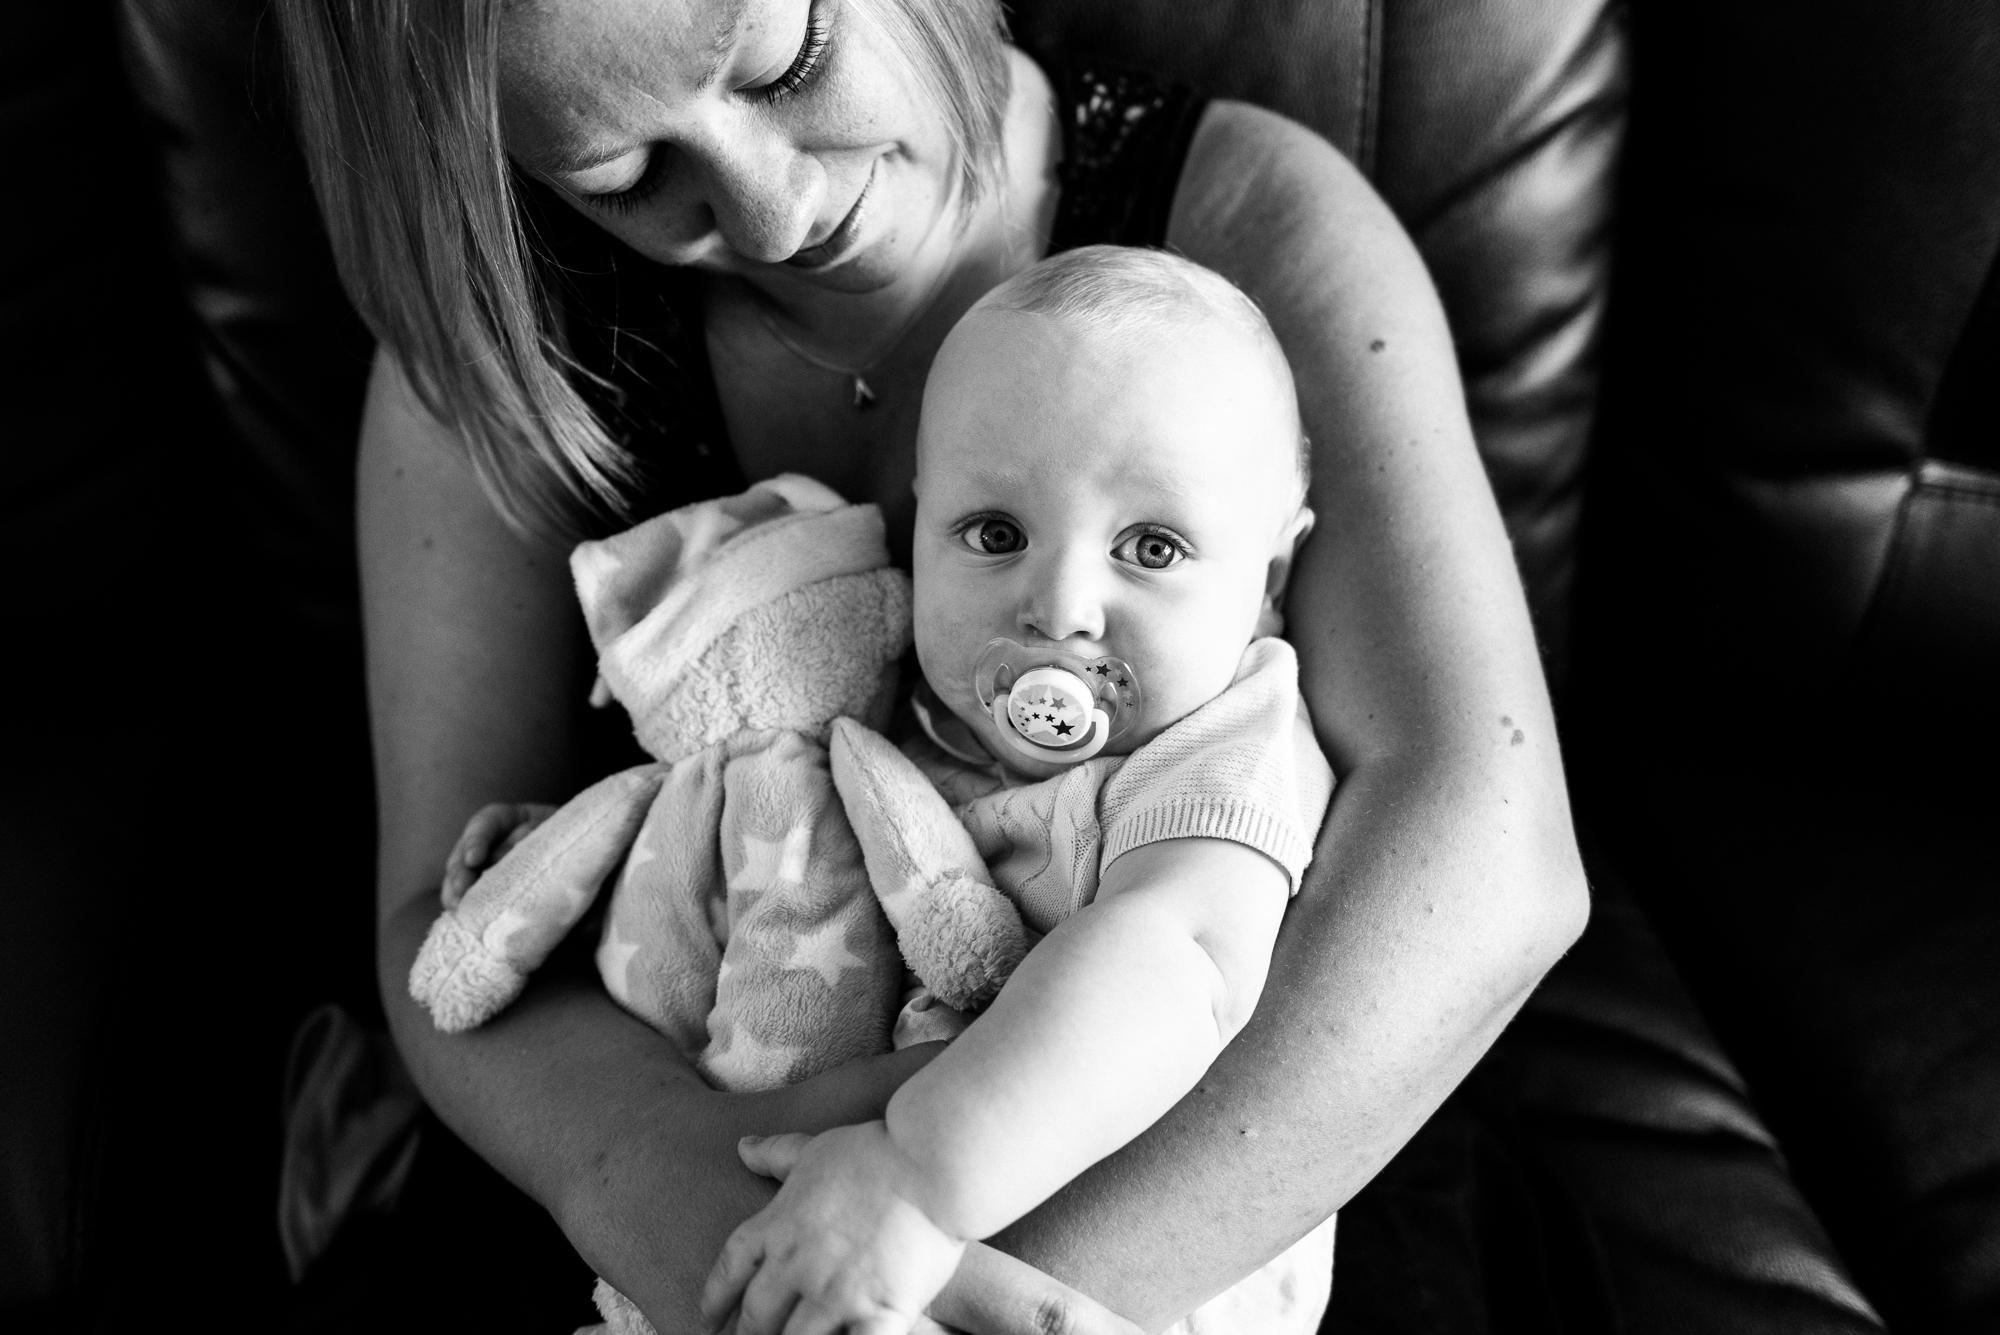 Cheshire Lifestyle Family Photography Baby Portrait Boys Park Swings Play - Jenny Harper Photographer-10.jpg